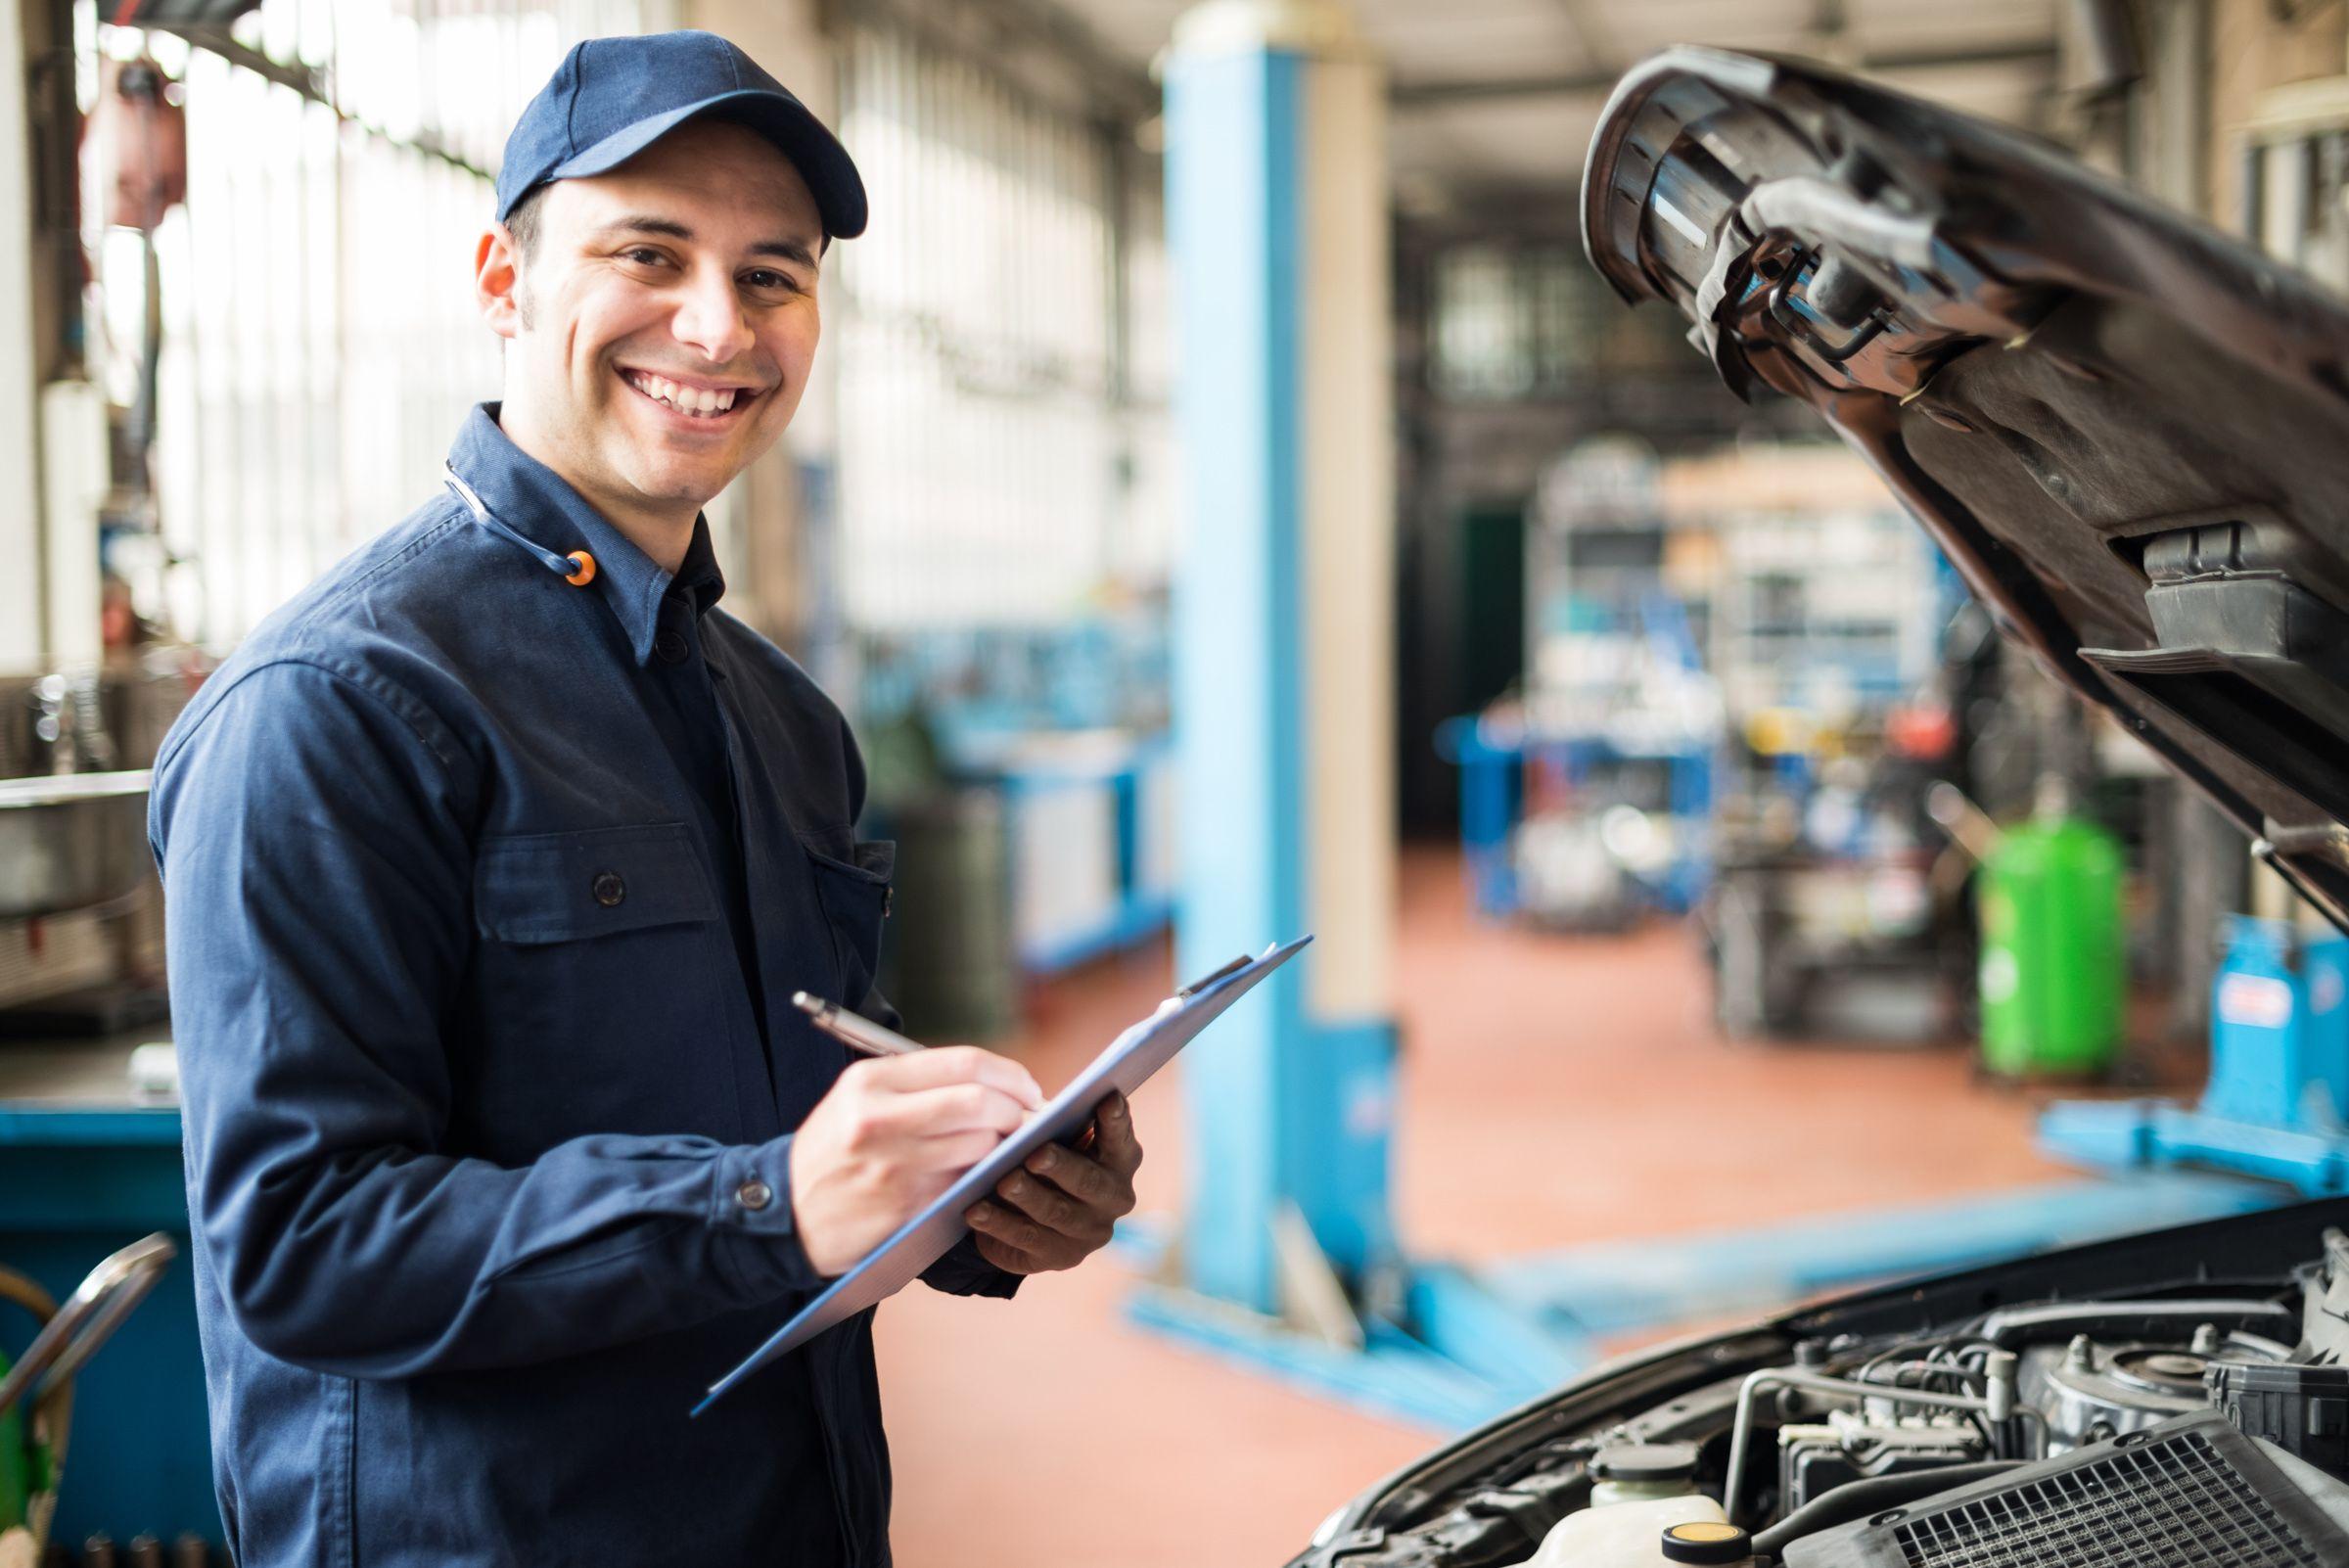 Auto Body Shop Merchant Processing Ca Horsesupplymerchantservices Autobodyshopmerchantprocessing Customcar Auto Service Vehicle Inspection Auto Repair Shop